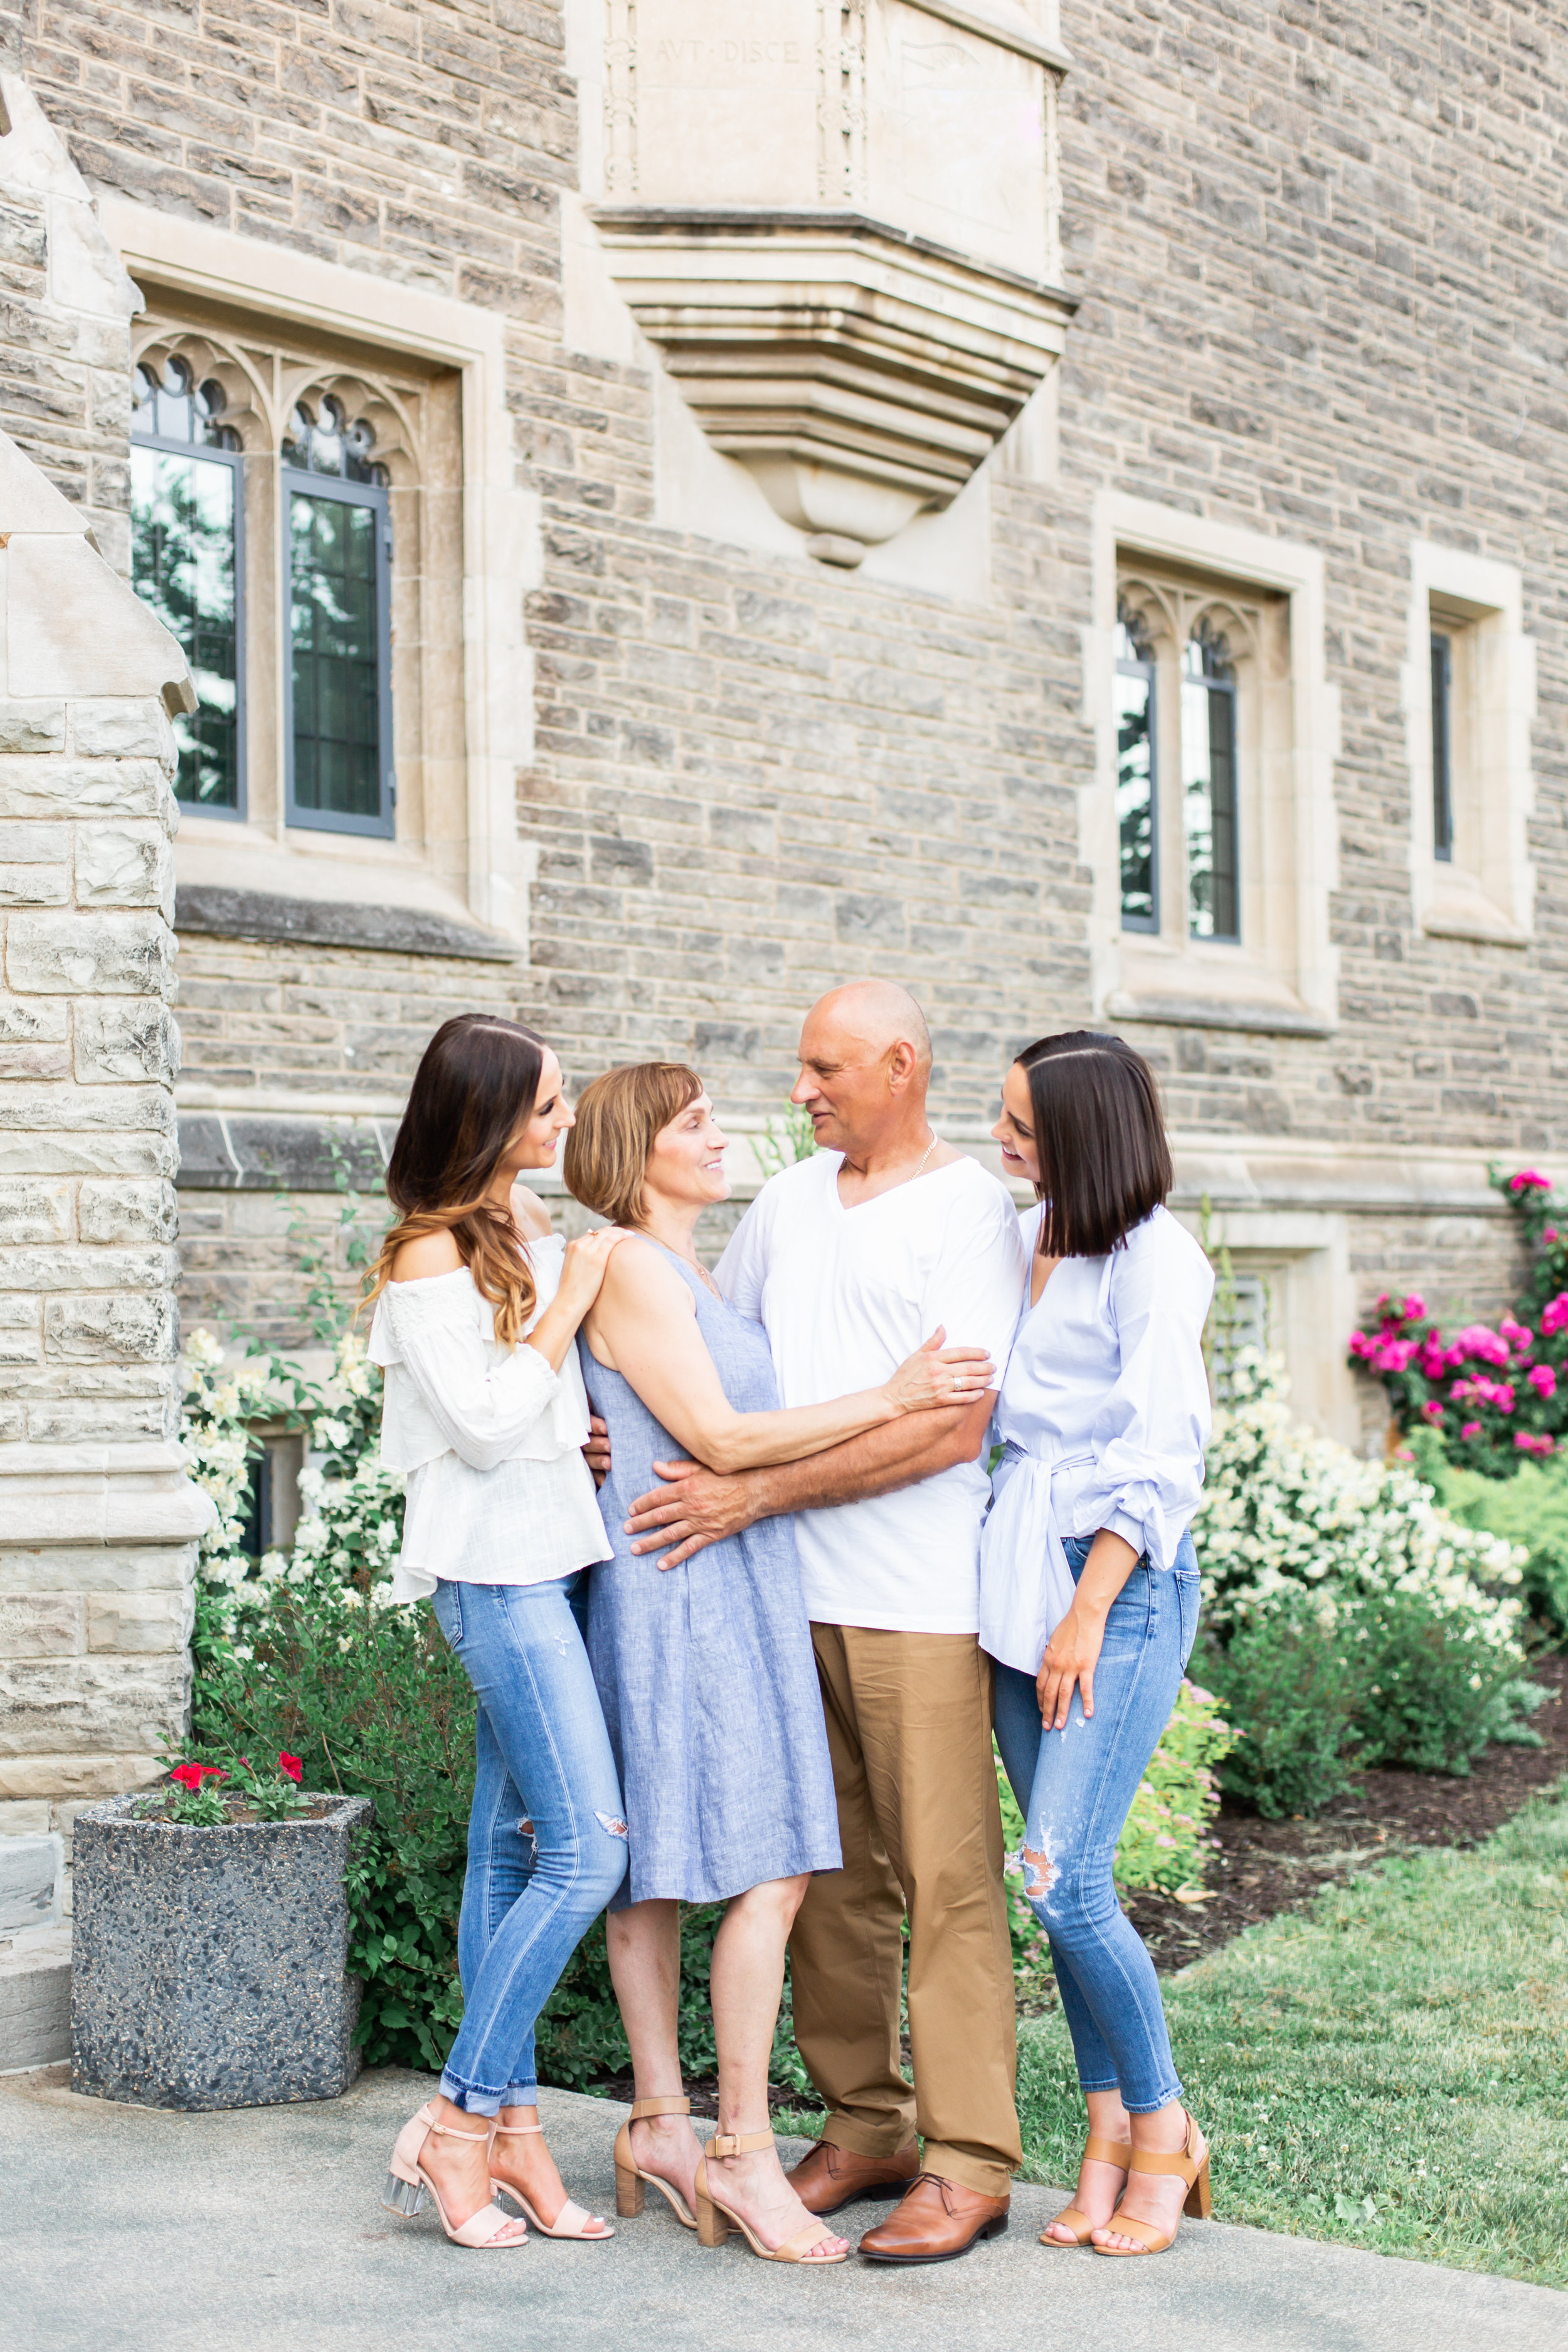 HAMILTONFAMILYSESSION-FAMILYPHOTOGRAPHY-FAMILYPHOTOGRAPHS-HAMONT-LIFESTYLEPHOTOGRAPHY-HAMILTONFAMILYPHOTOGRAPHER-MCMASTERUNIVERSITY-ALEXANDRADELBELLOPHOTOGRAPHY-55.jpg